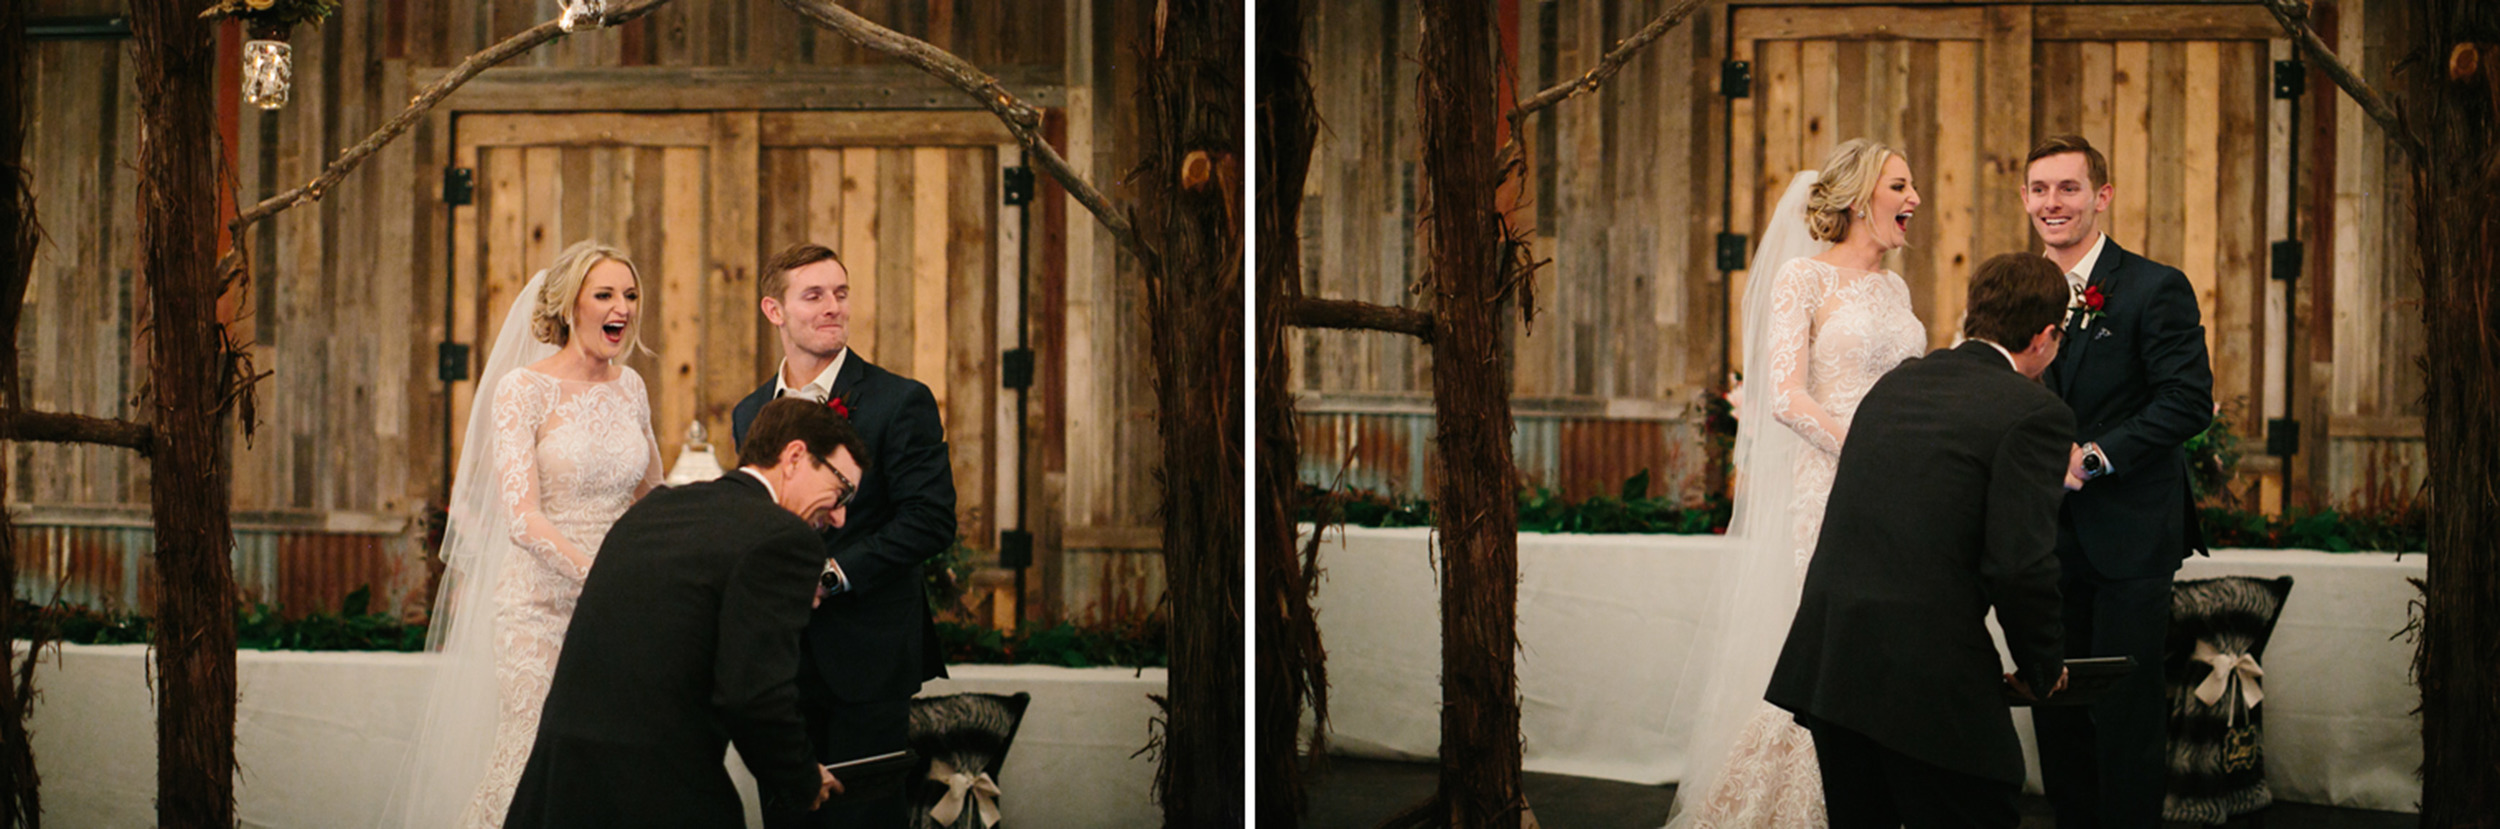 Cotton_Creek_Barn_Winter_Wedding_WeddingPhotographer046.jpg